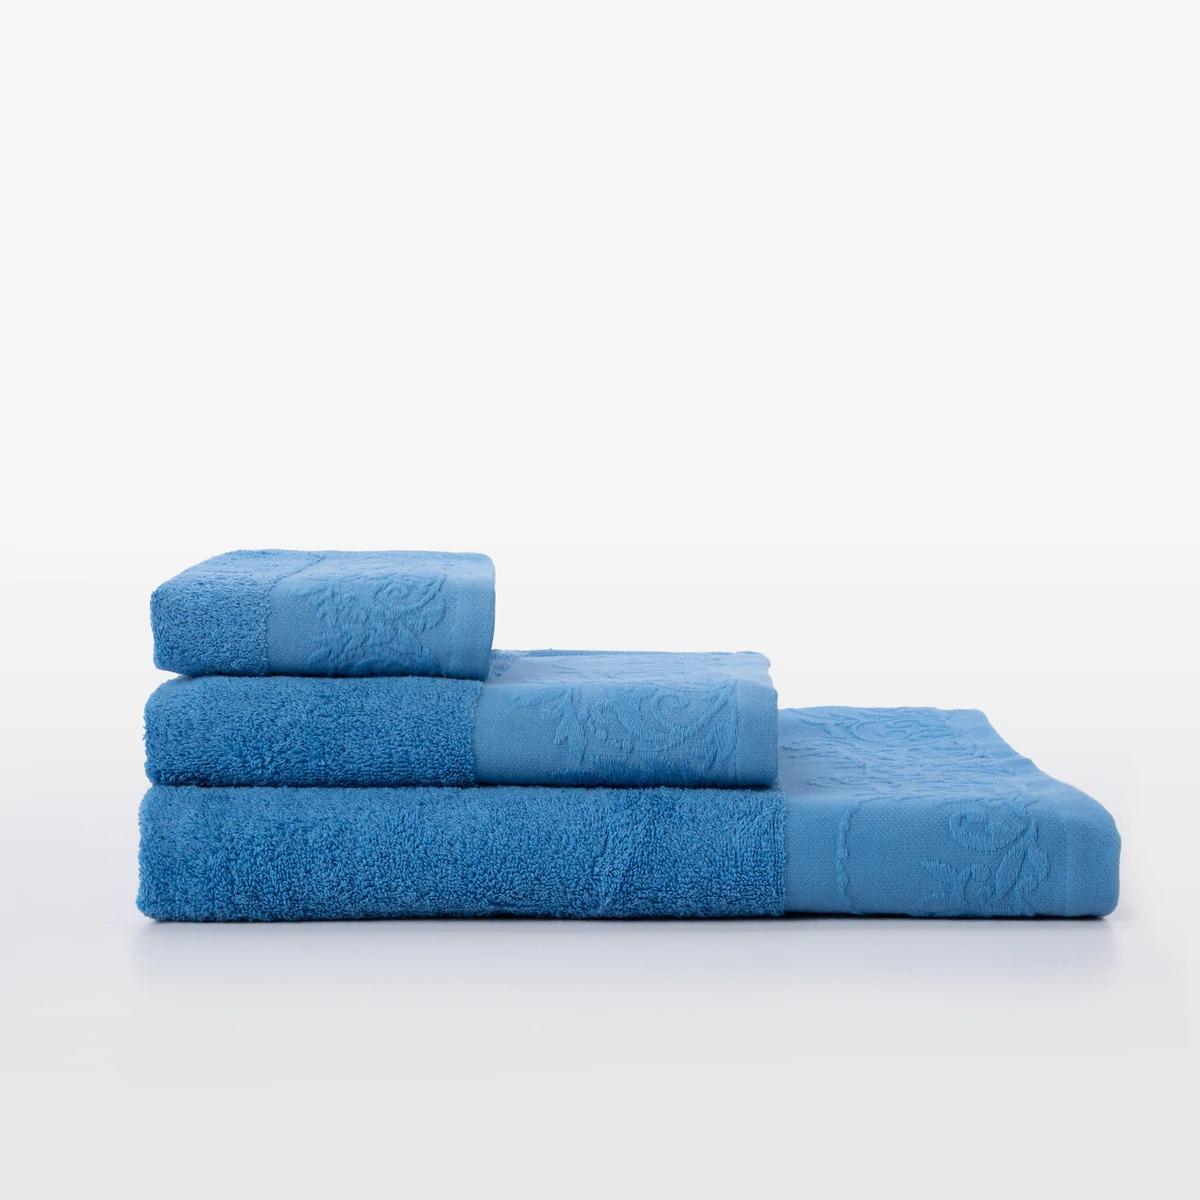 EL CORTE INGLÉS Toalla de baño de algodón New Coimbra El Corte Inglés